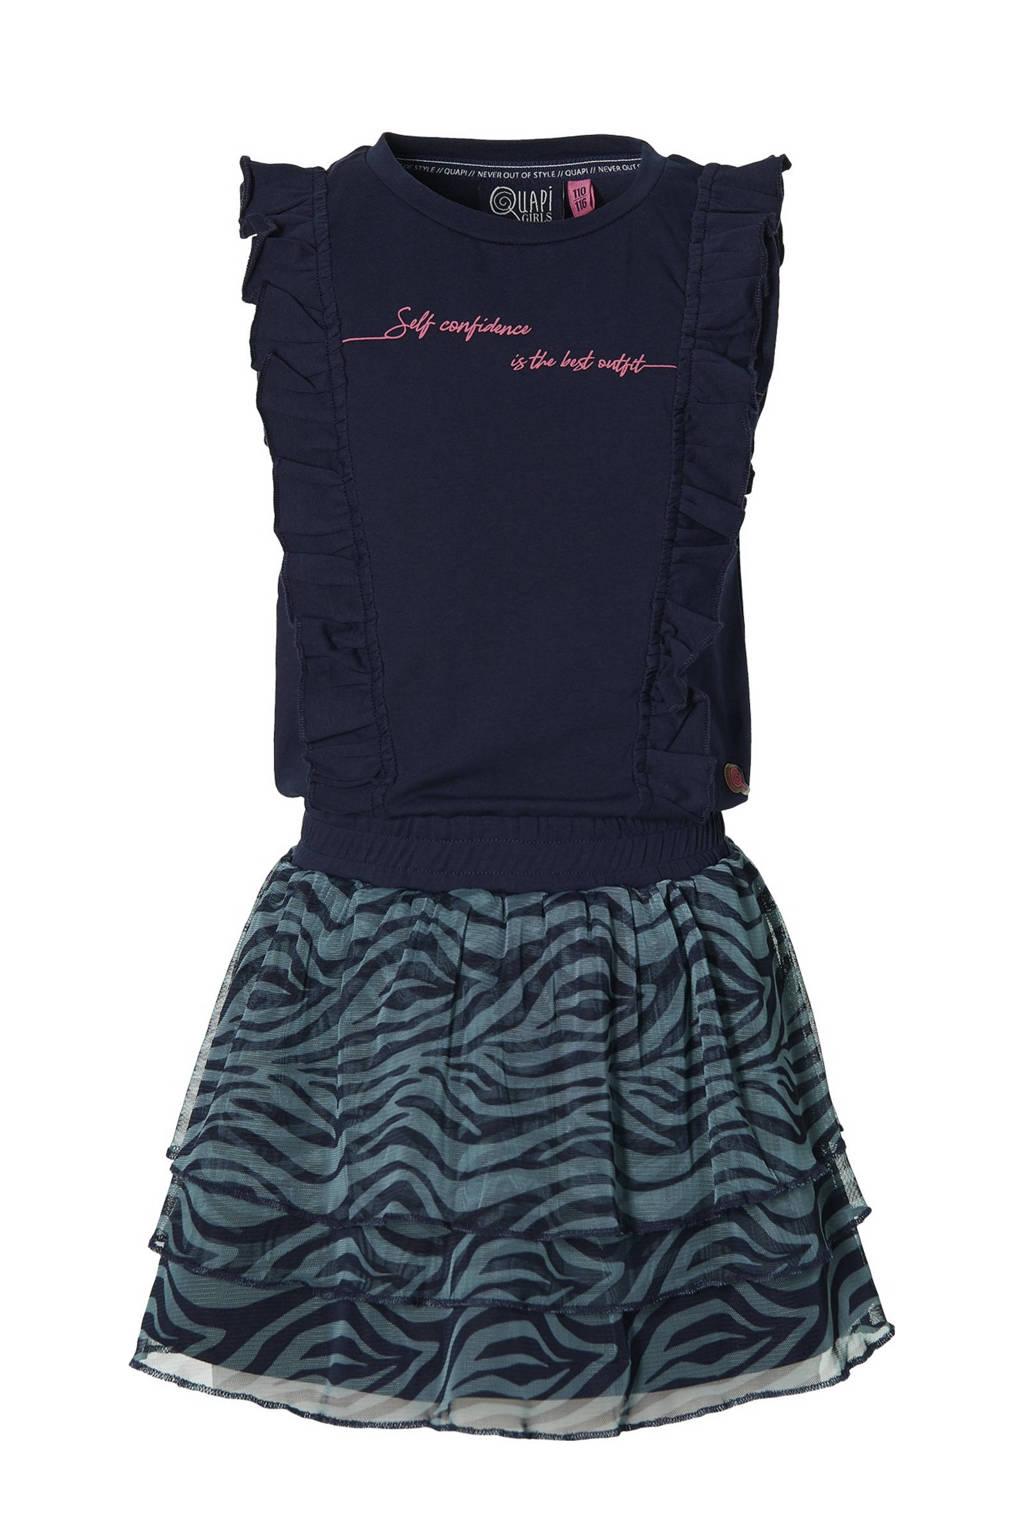 Quapi Girls jurk Fania met all over print en ruches donkerblauw/blauw, Donkerblauw/blauw